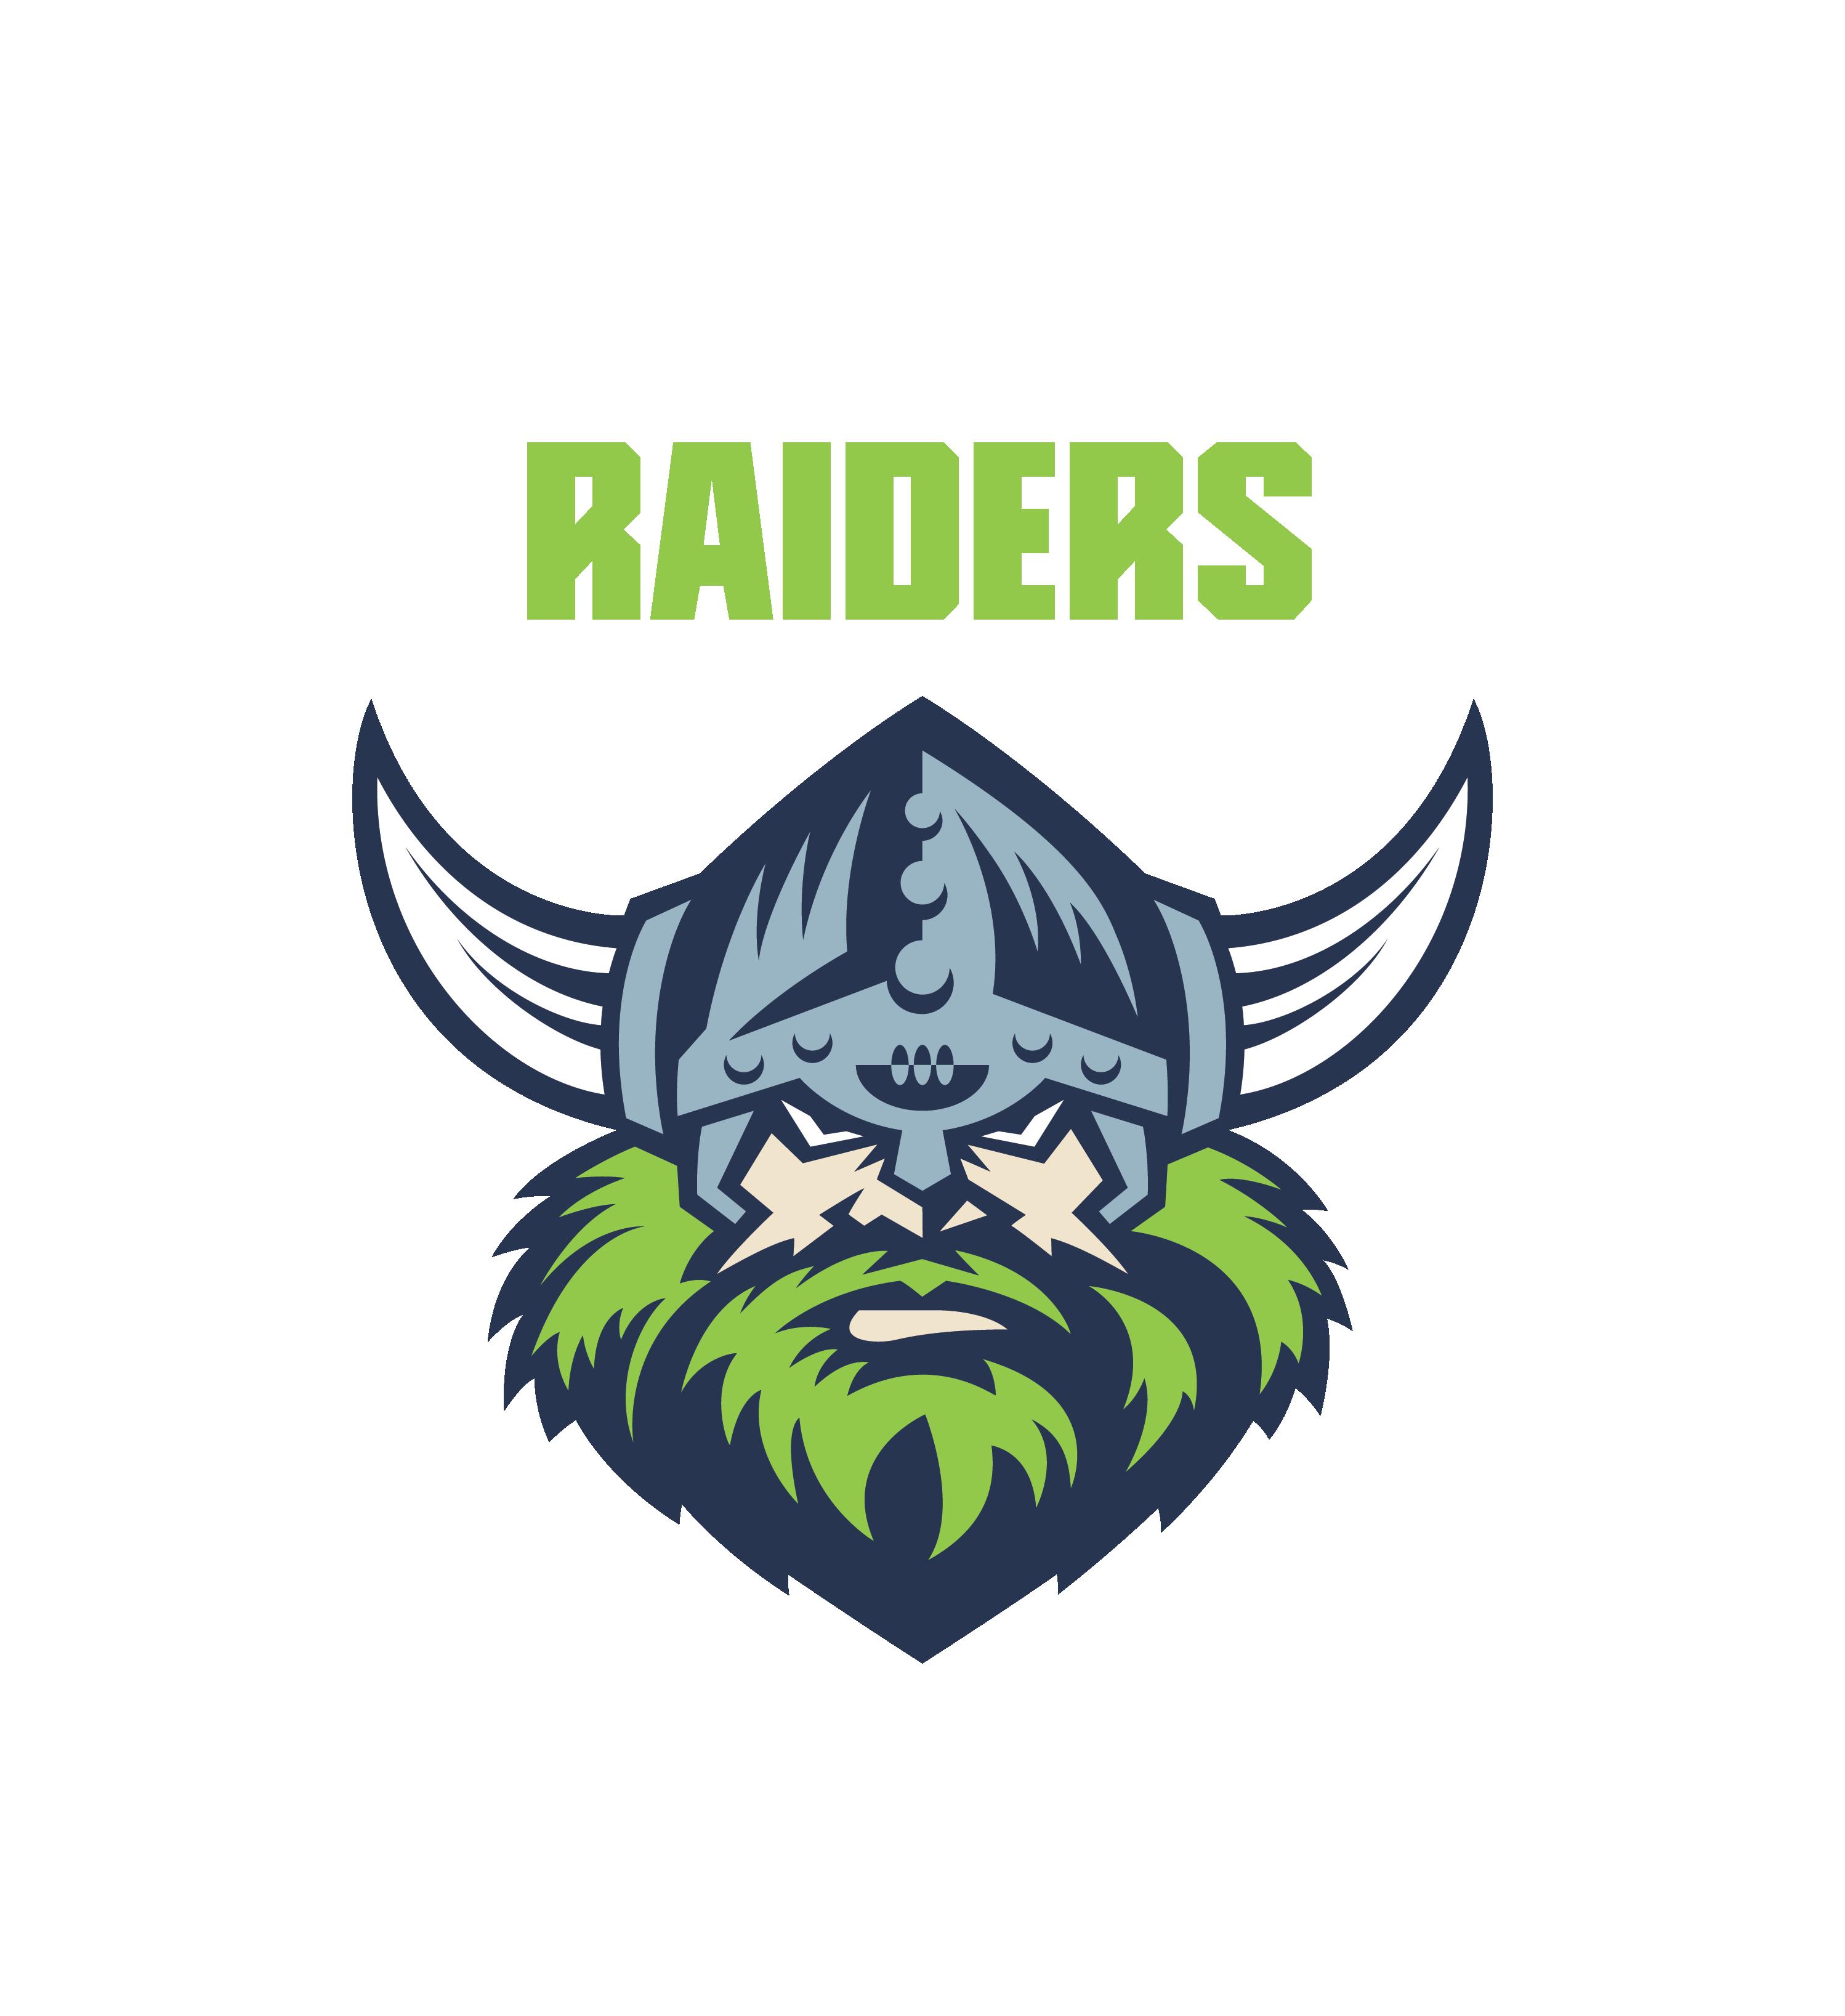 Canberra Raiders logo